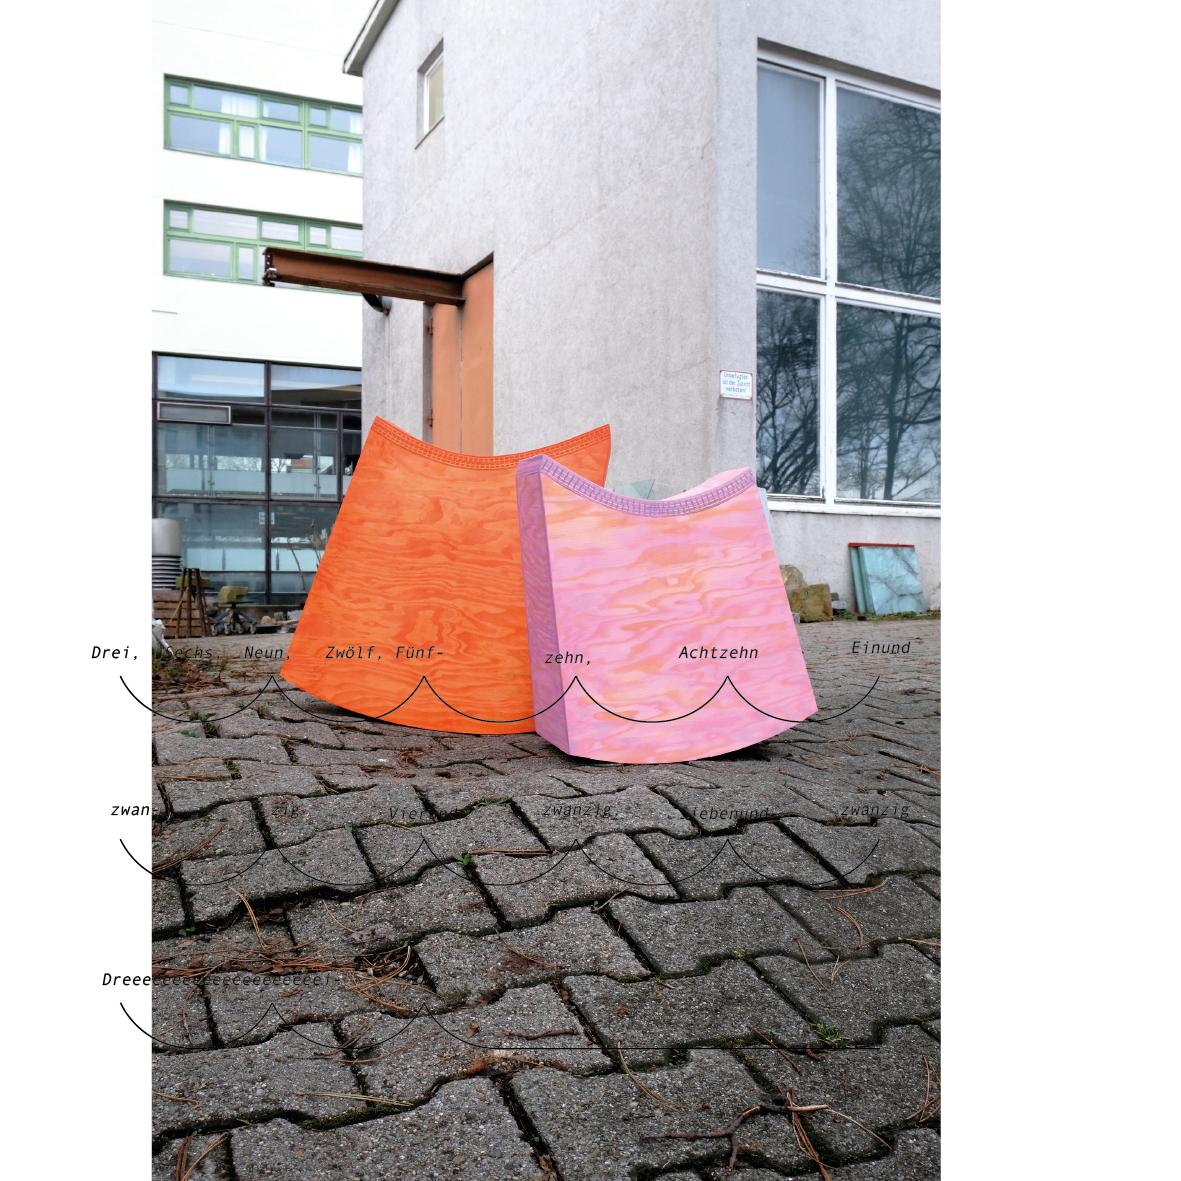 kooperation sebastian klawiter kunstakademie stuttgart architektur master